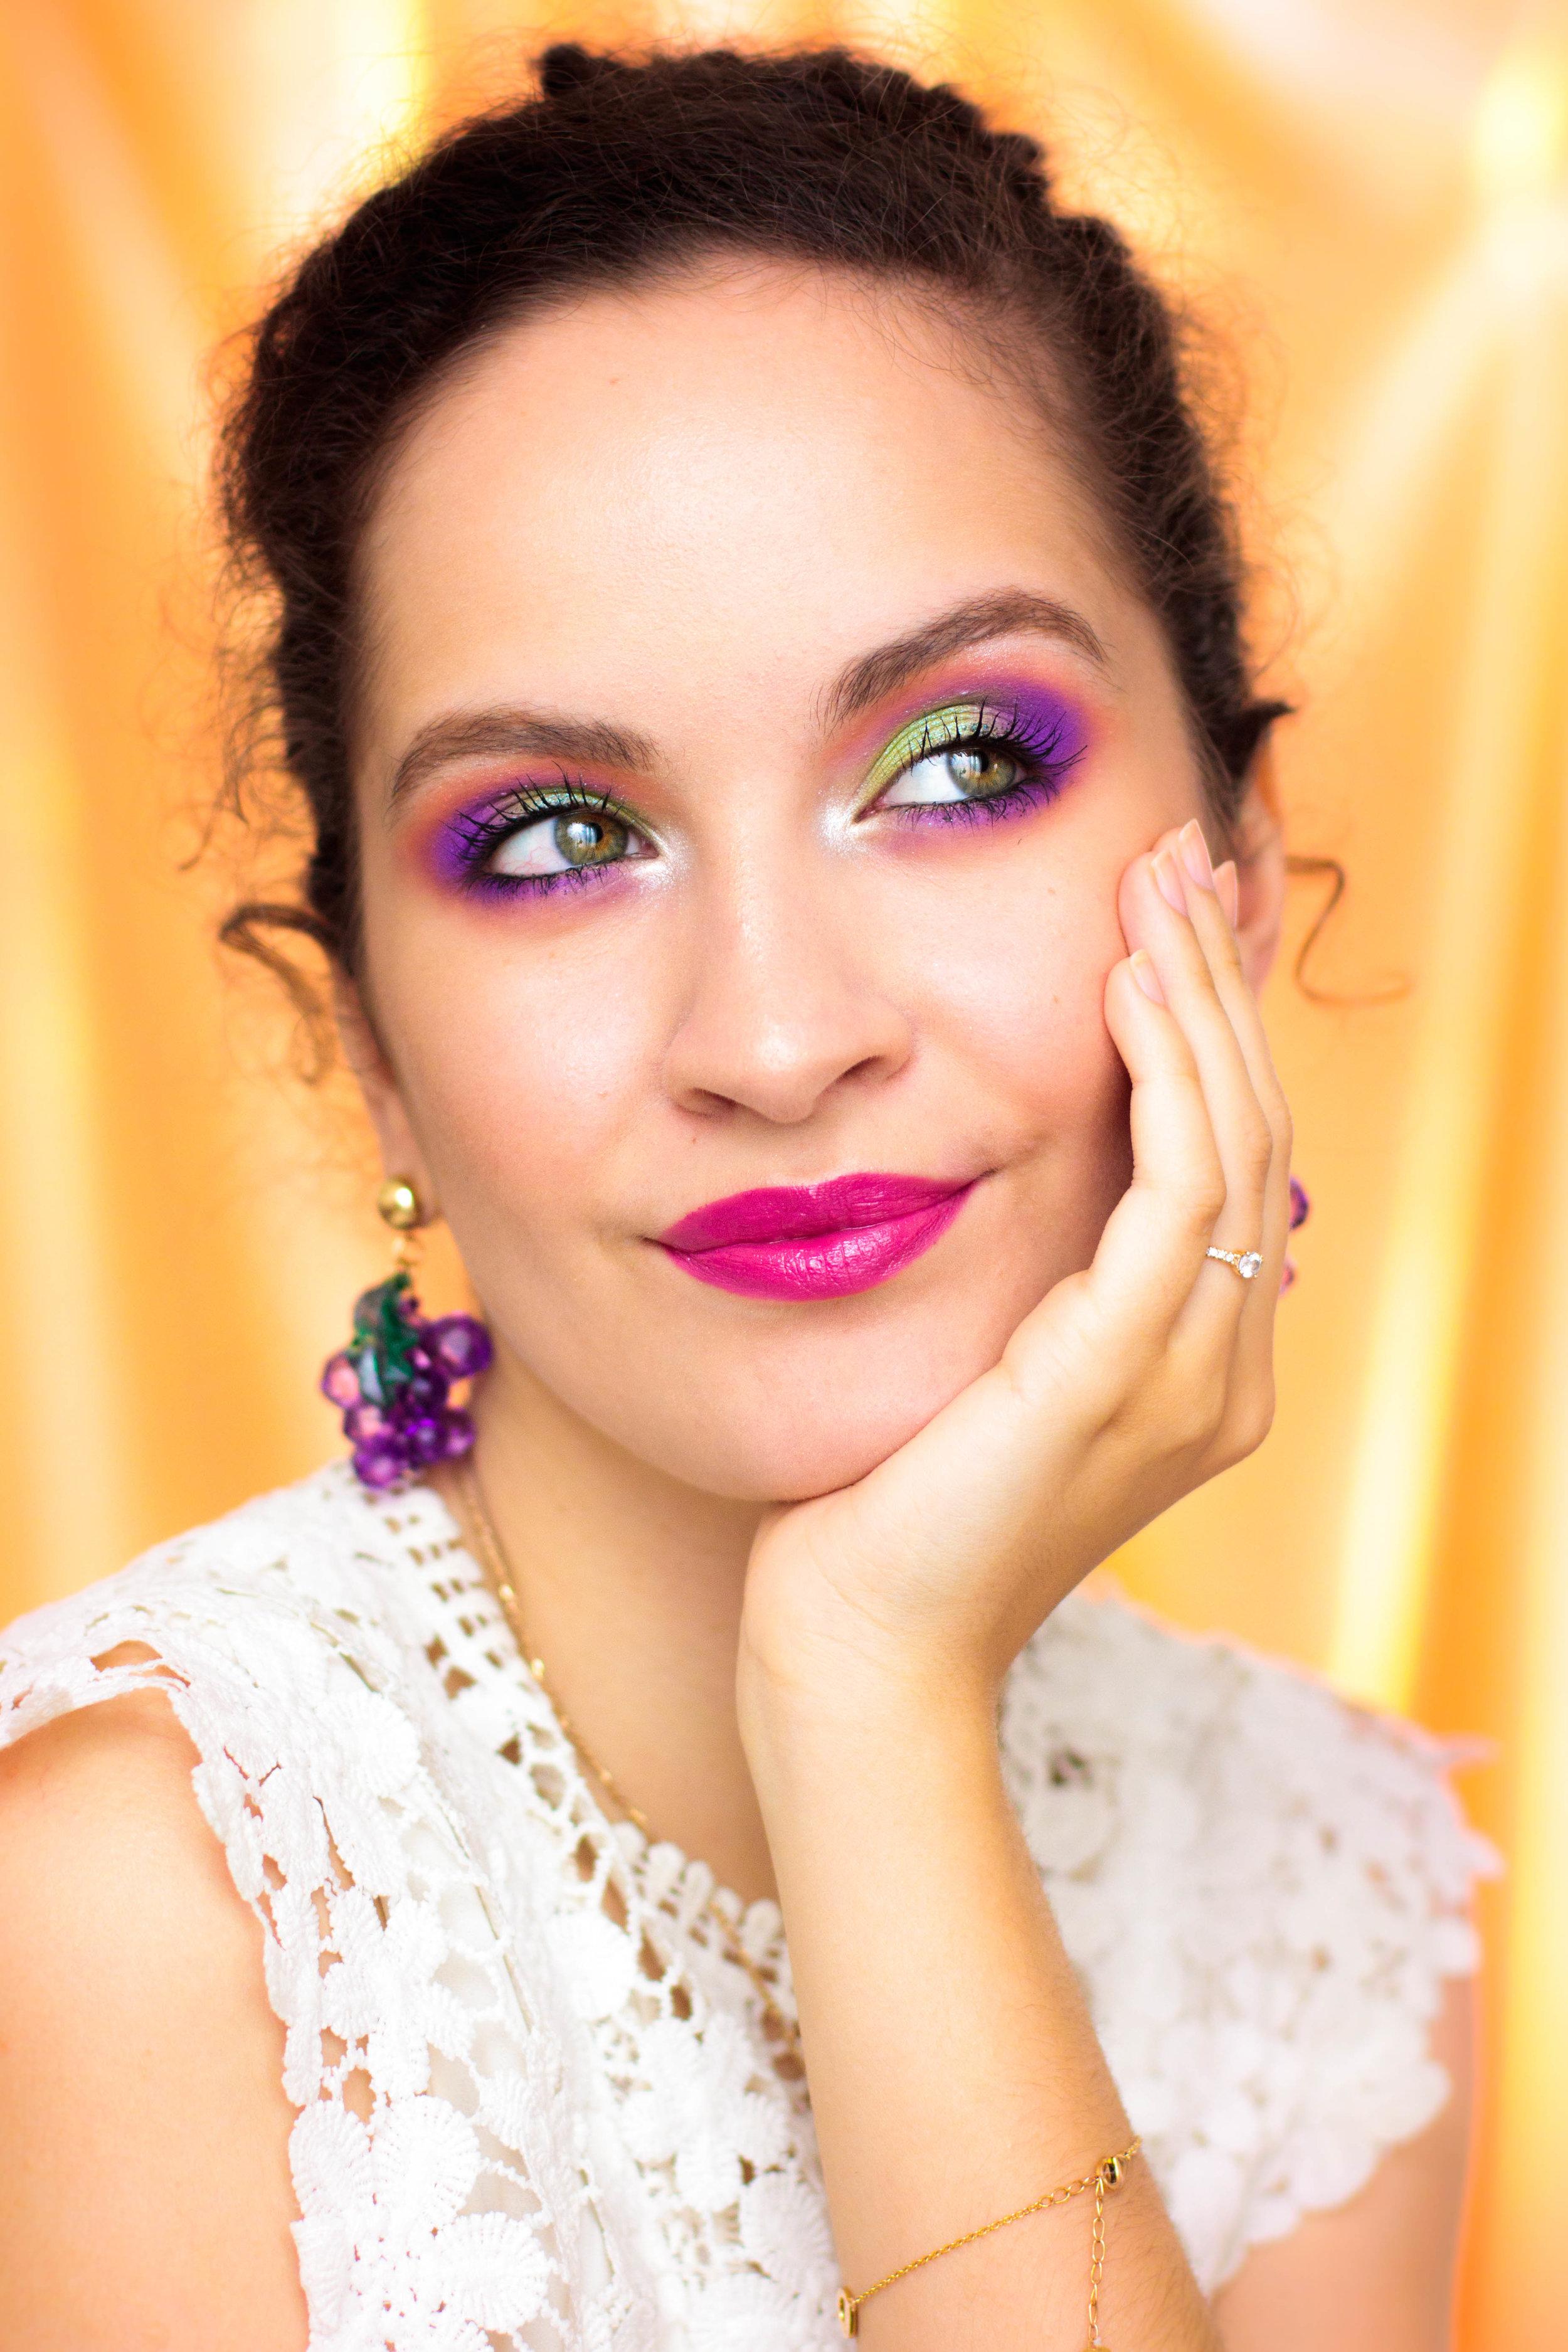 makeup-pauuulette-eyn-bright-matte-beauty-bay-makeup-revolution-chocolate-lime-1.jpg